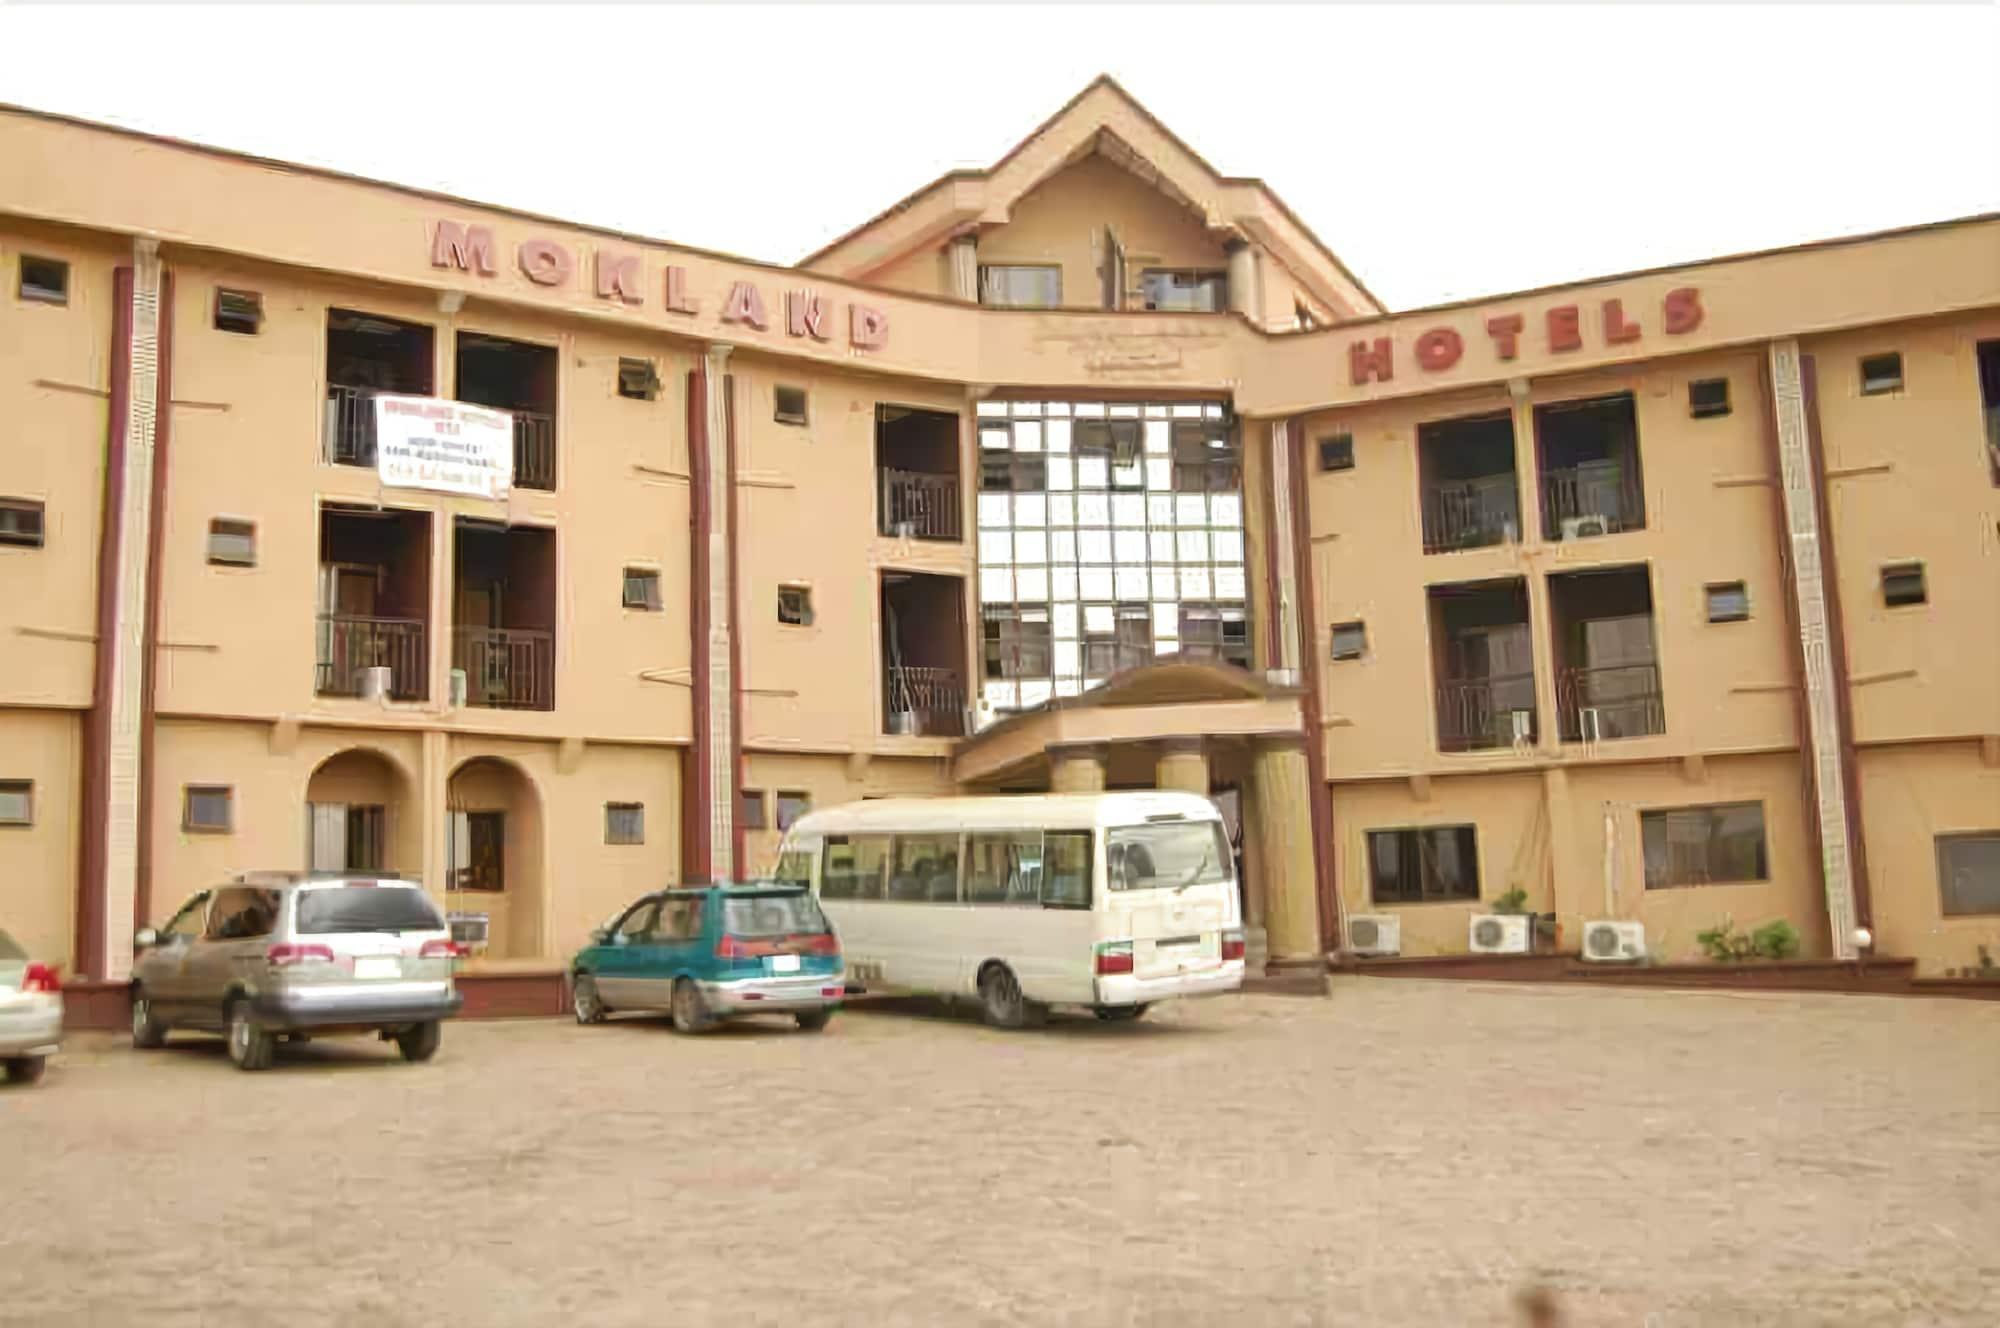 Mokland Hotel and Suites, Obafemi-Owode